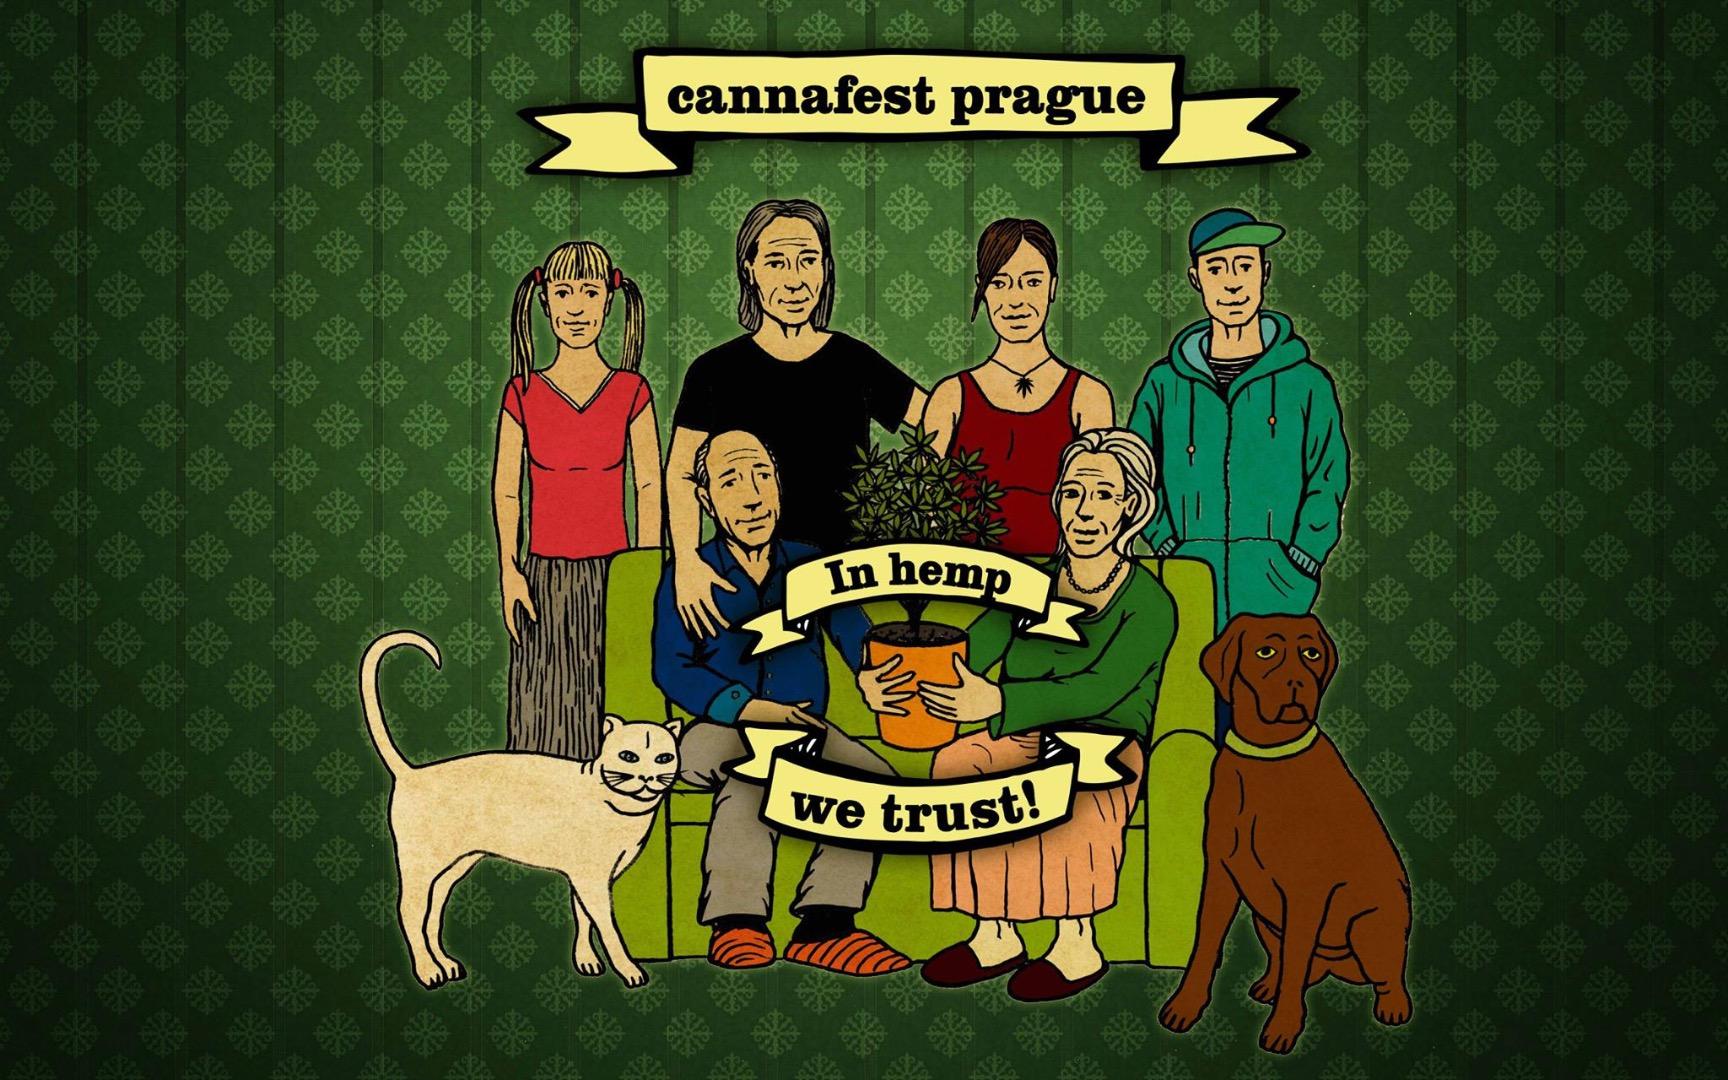 Прага готовится к Каннaфесту!